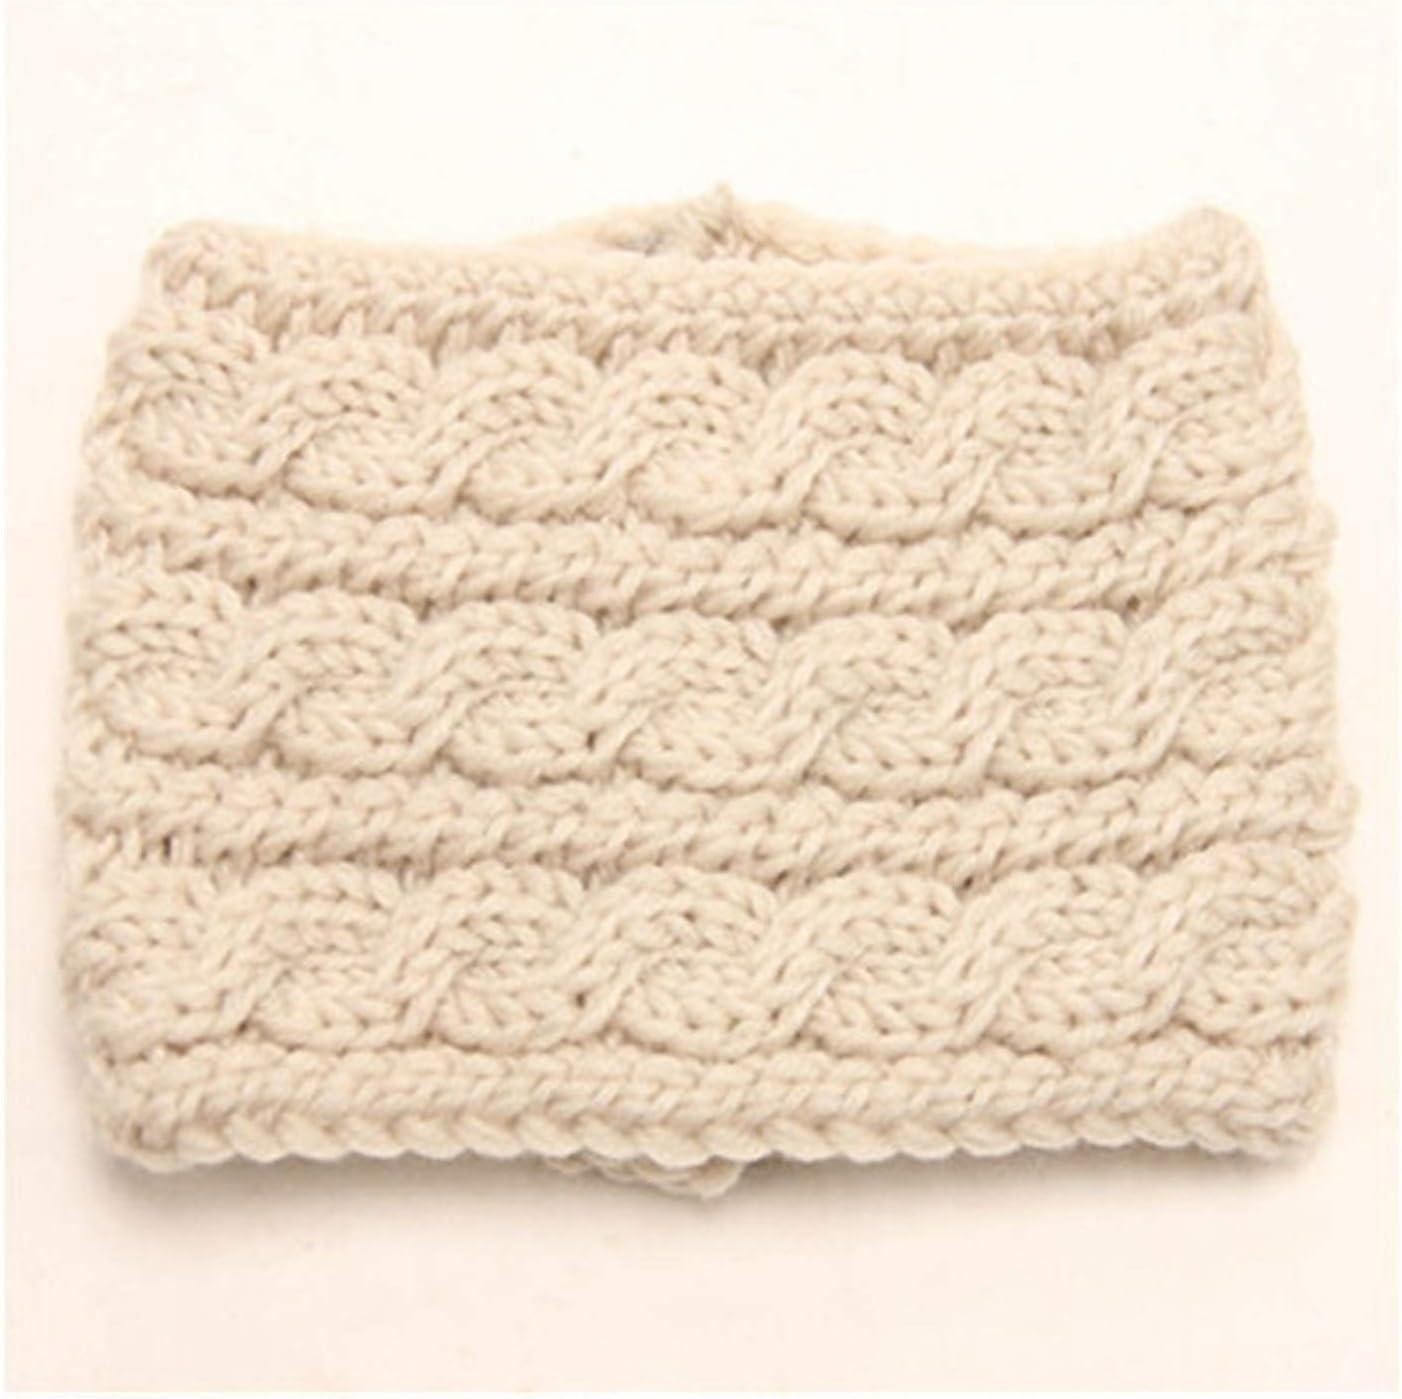 Baby Fan Woven Wool Headband Winter Ear Protection for Women to Keep Warm Headband Headwear (Color : A1, Size : Size fits All)